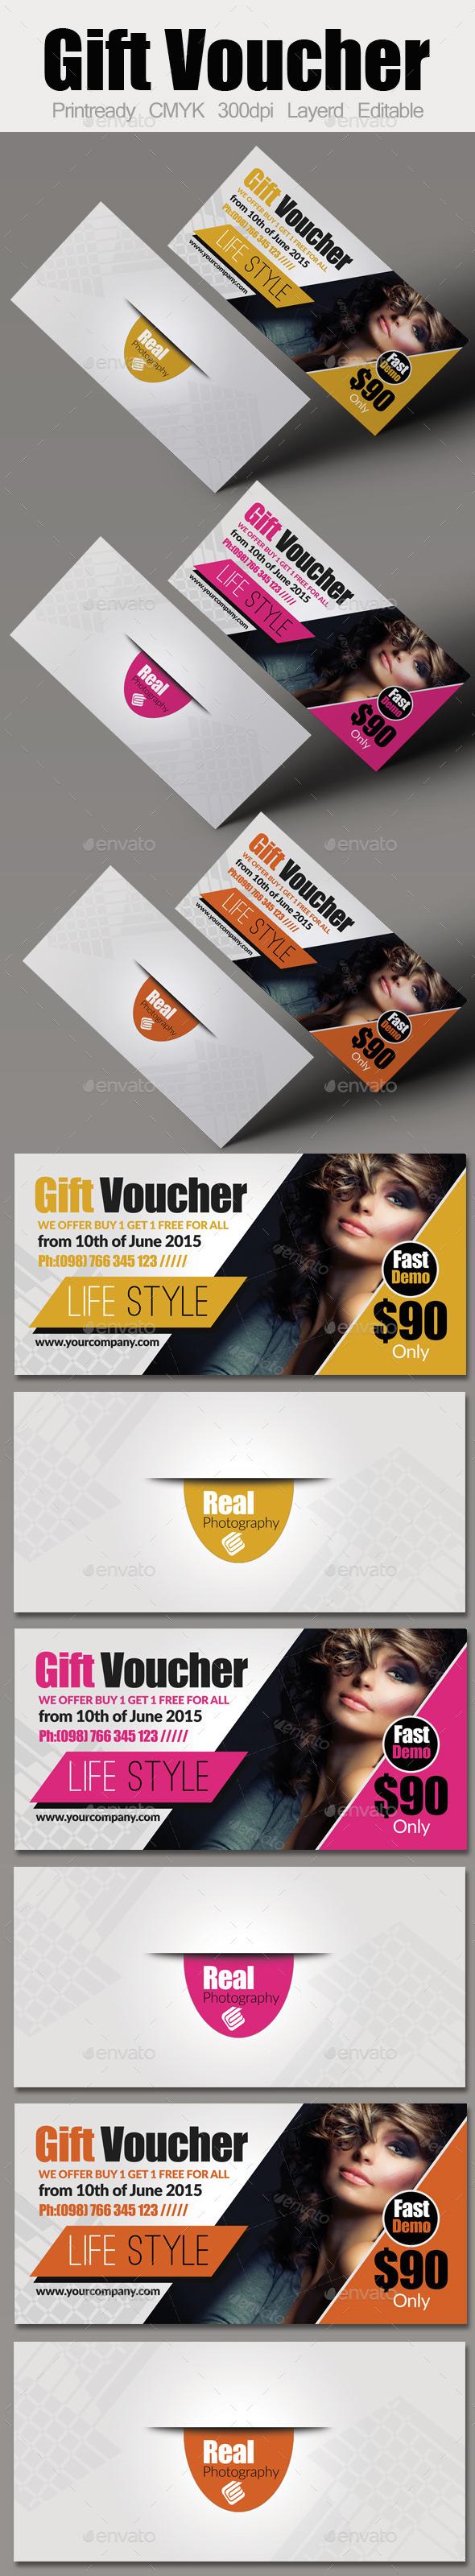 Simple & Clean Flexible Gift Voucher